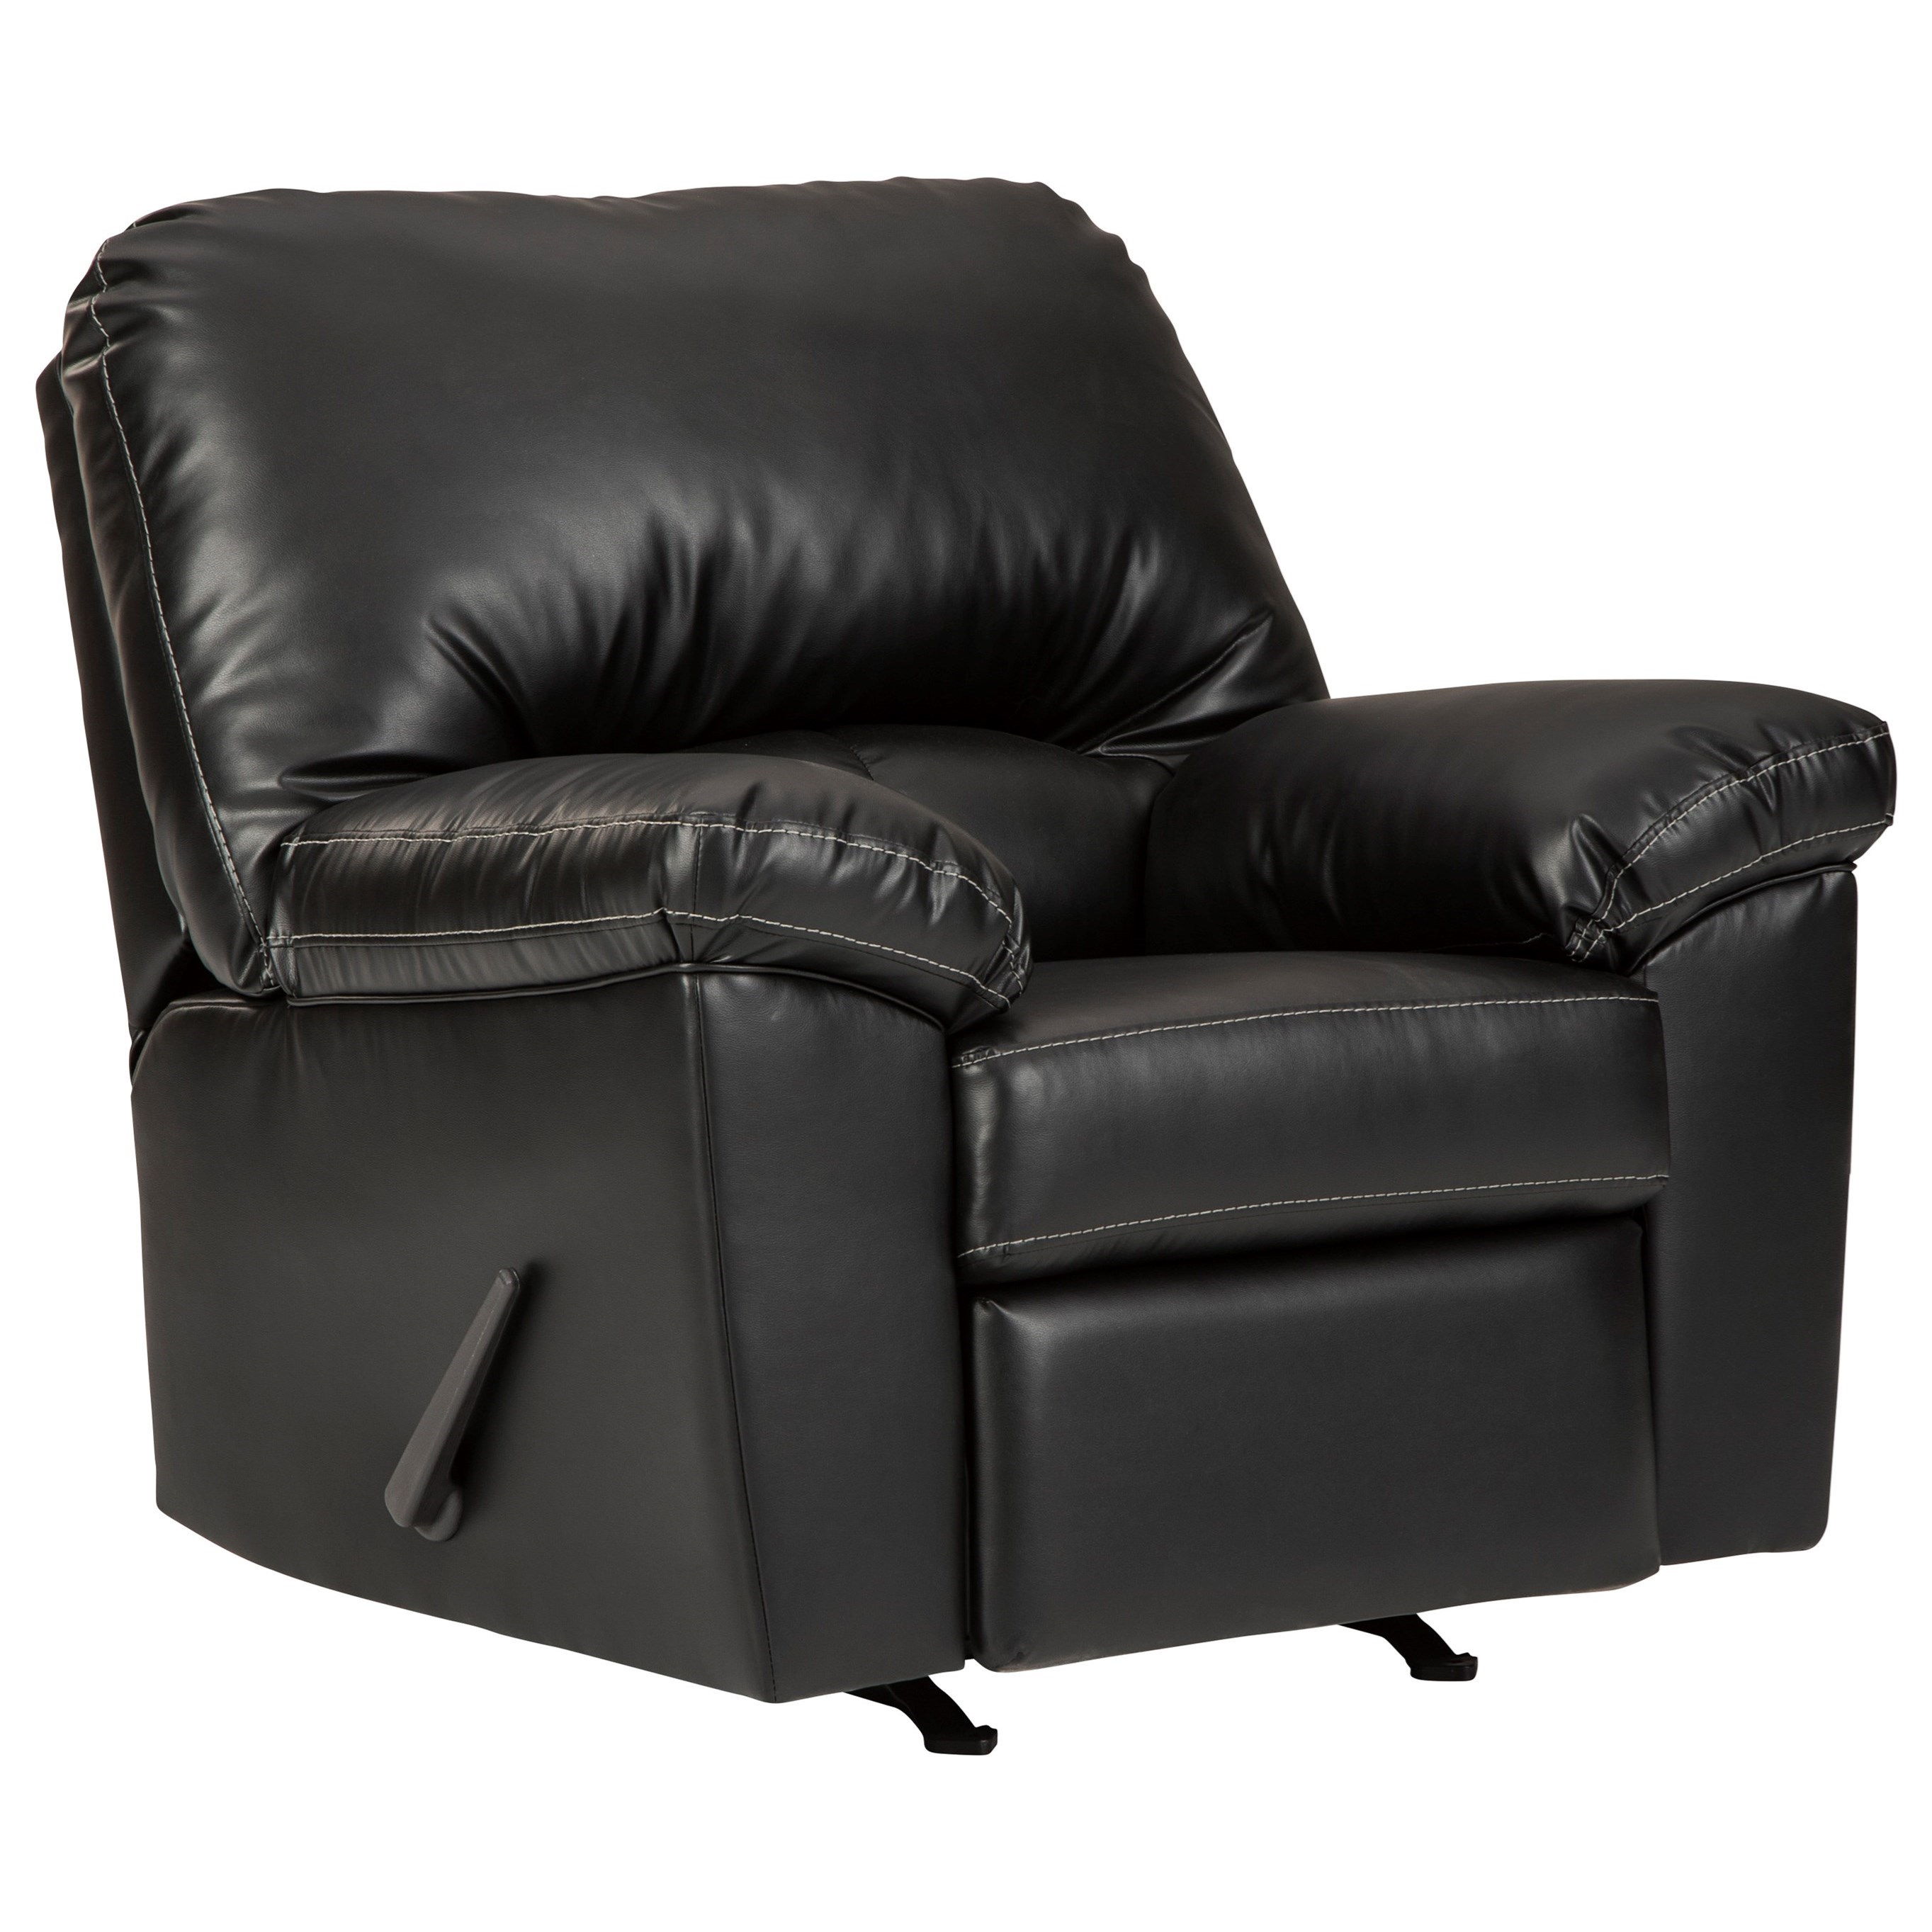 Brazoria Rocker Recliner by Benchcraft at Value City Furniture